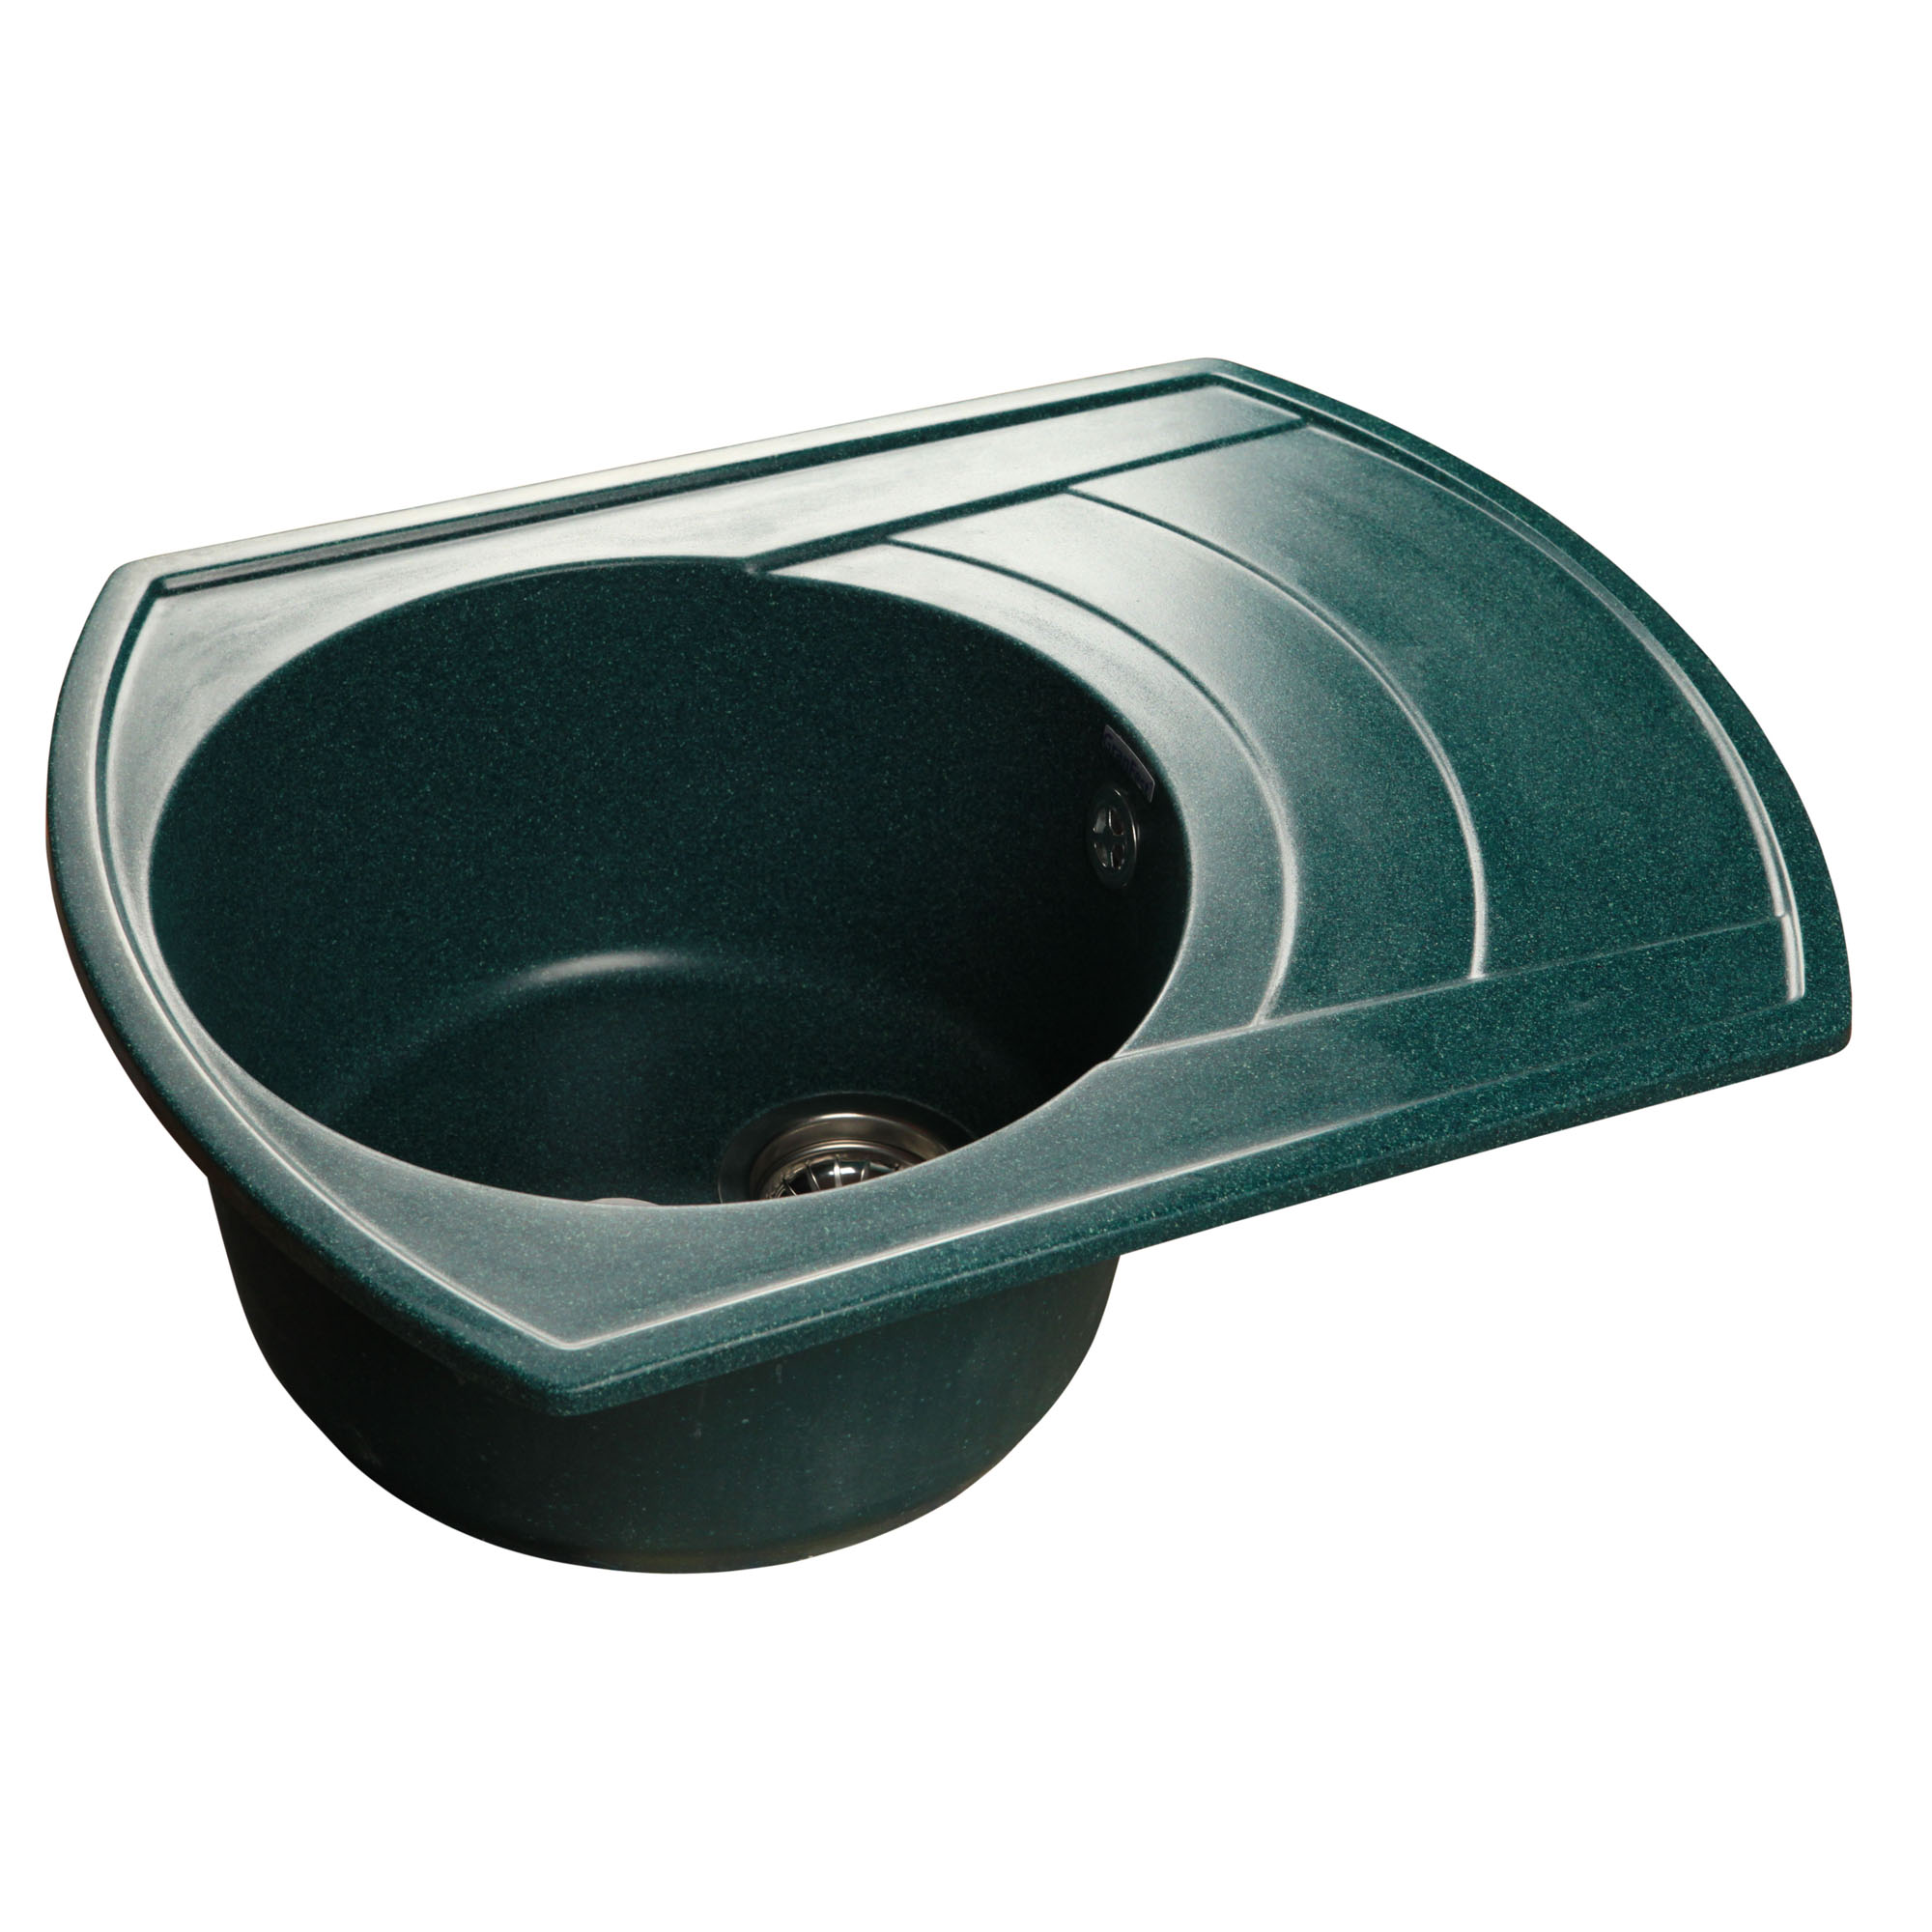 Кухонная мойка GranFest Rondo GF-R650L зеленый мойка кухонная granfest гранит 650x500 чаша крыло gf r650l черная